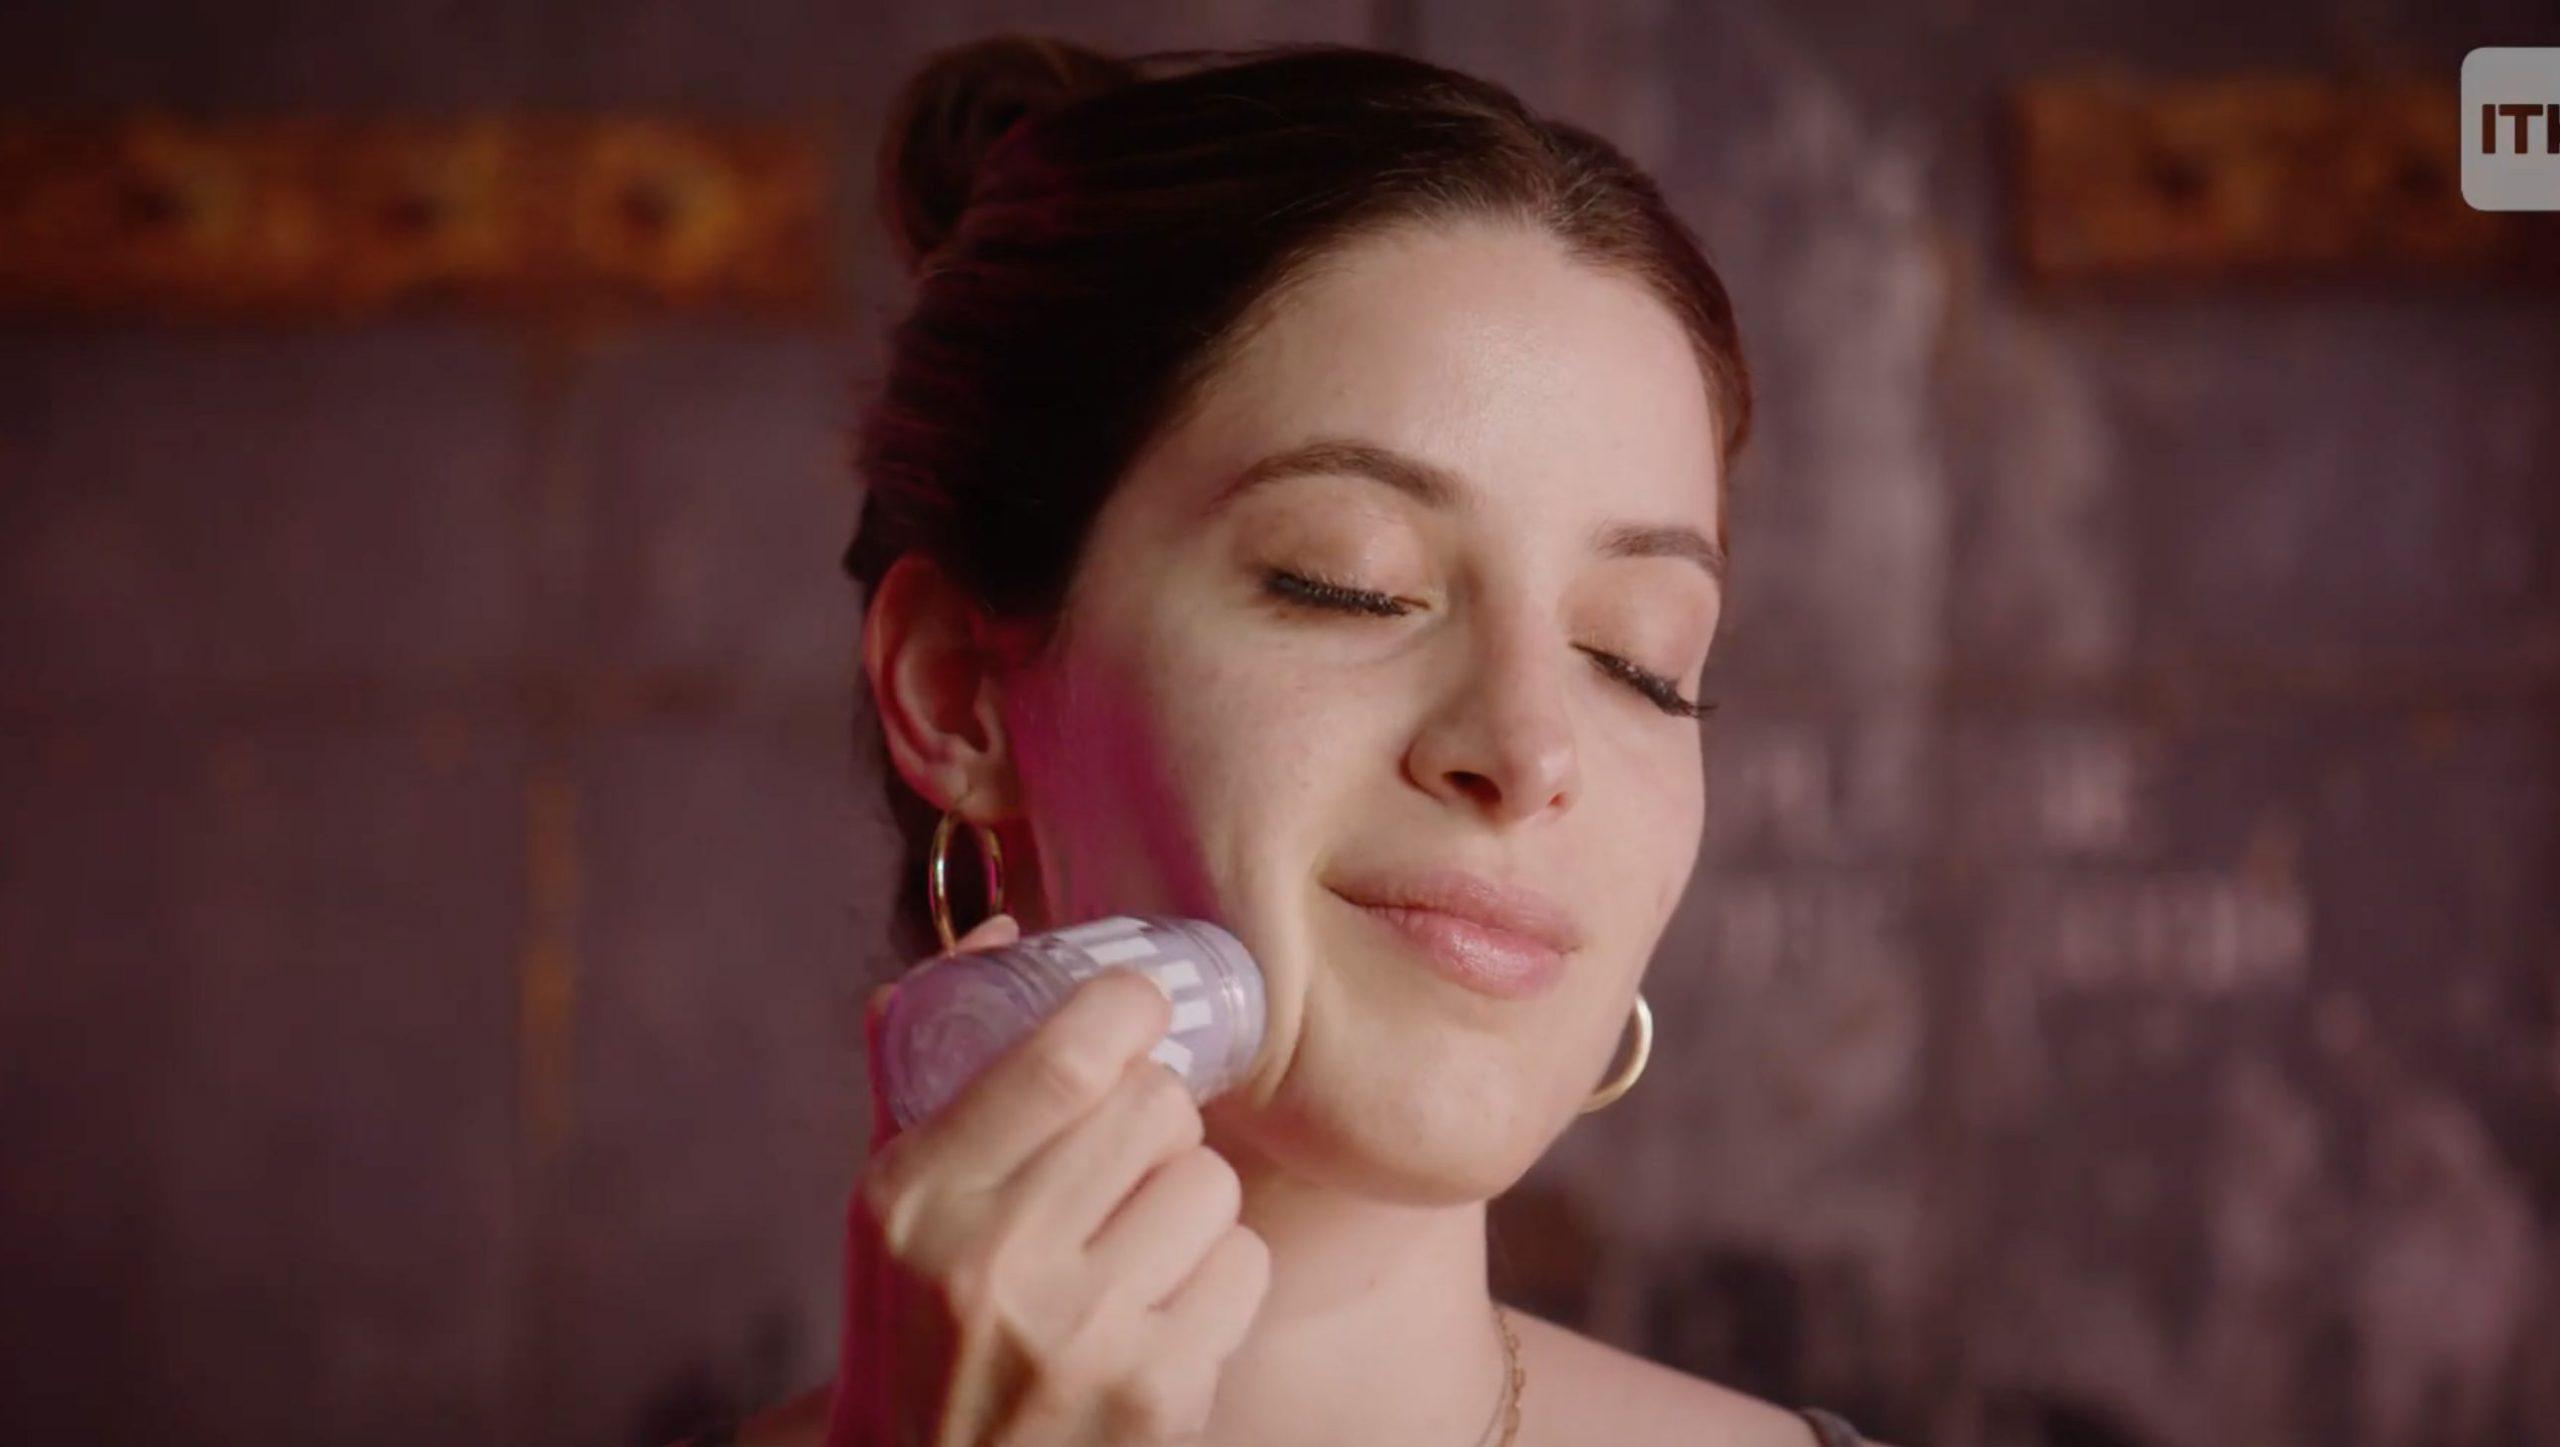 TikTok beauty guru Mireya Rios creates the most satisfying ASMR skincare content